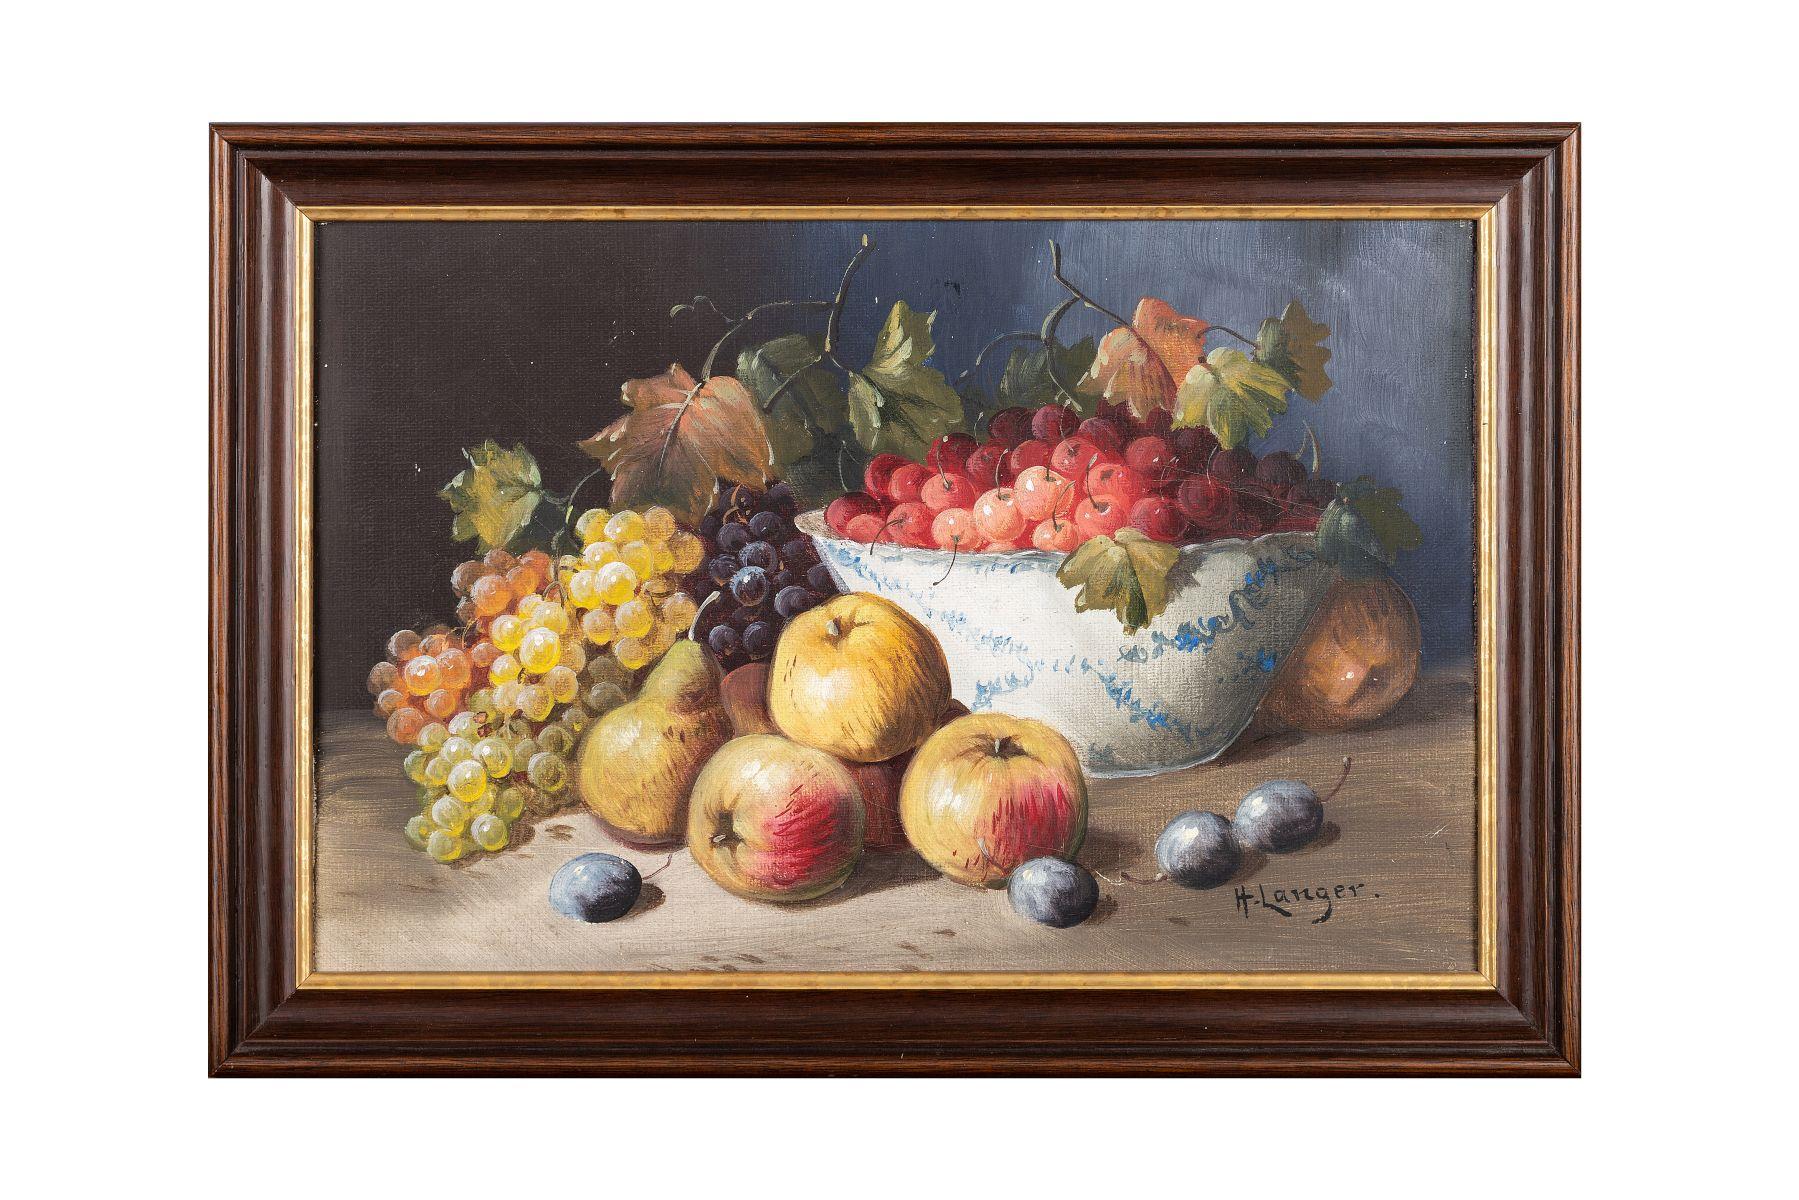 #105 H. Langer, Fruit Still Life, Around 1900   H. Langer, Früchtestillleben, um 1900 Image